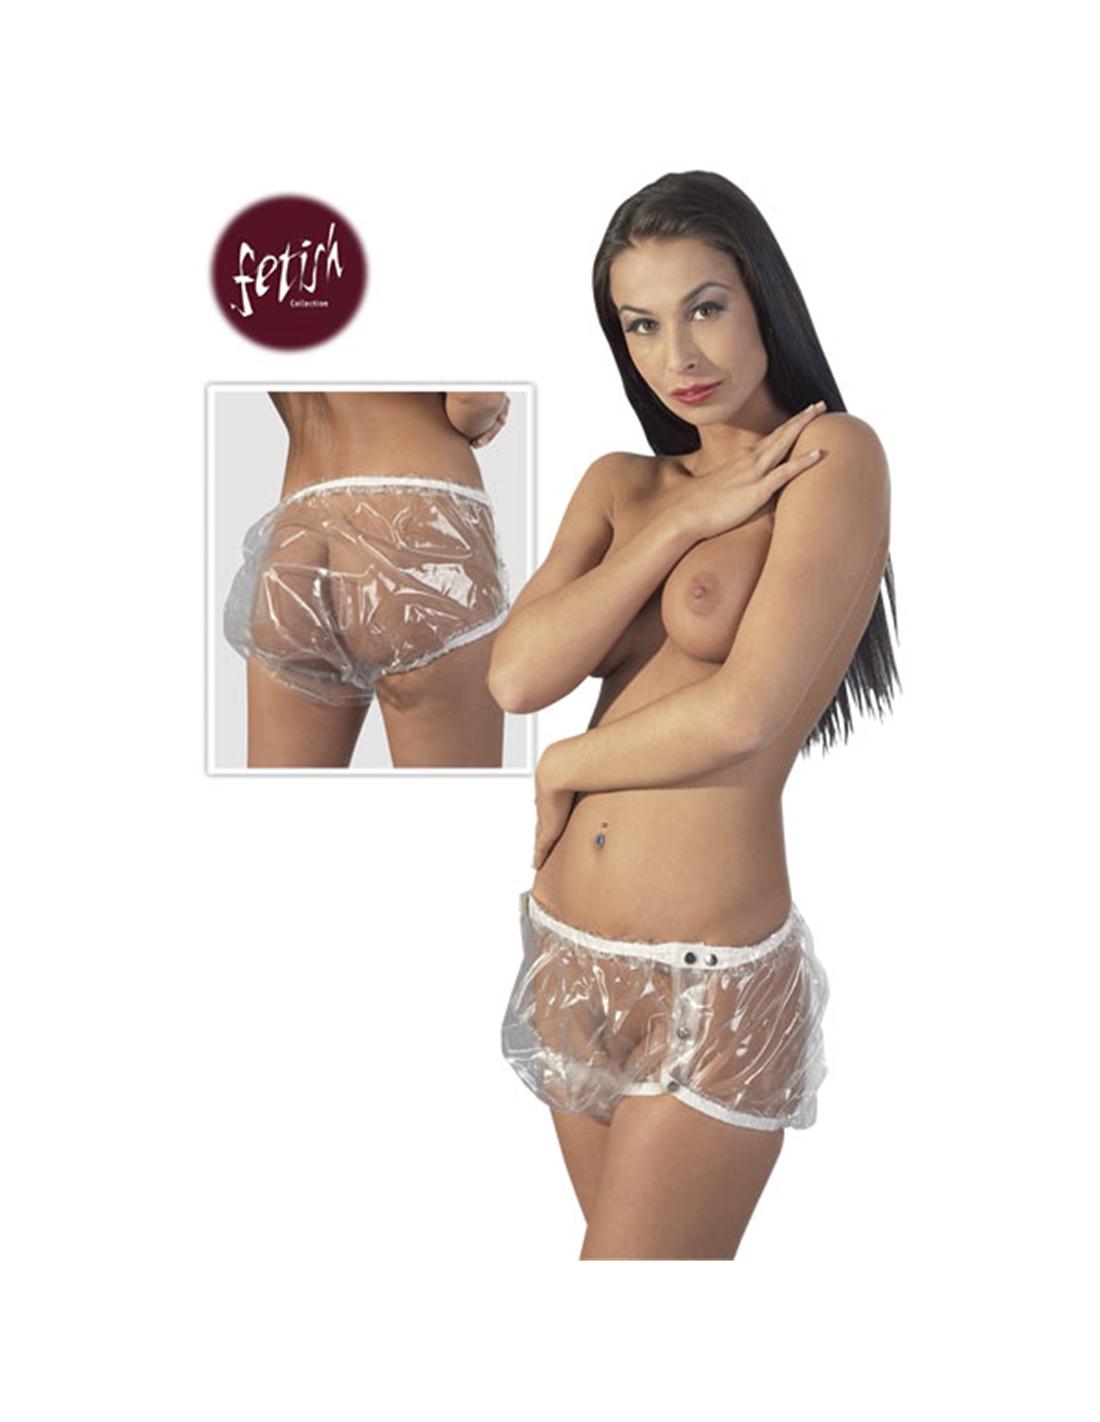 Windel Slip Transparente M/L - DO29090721